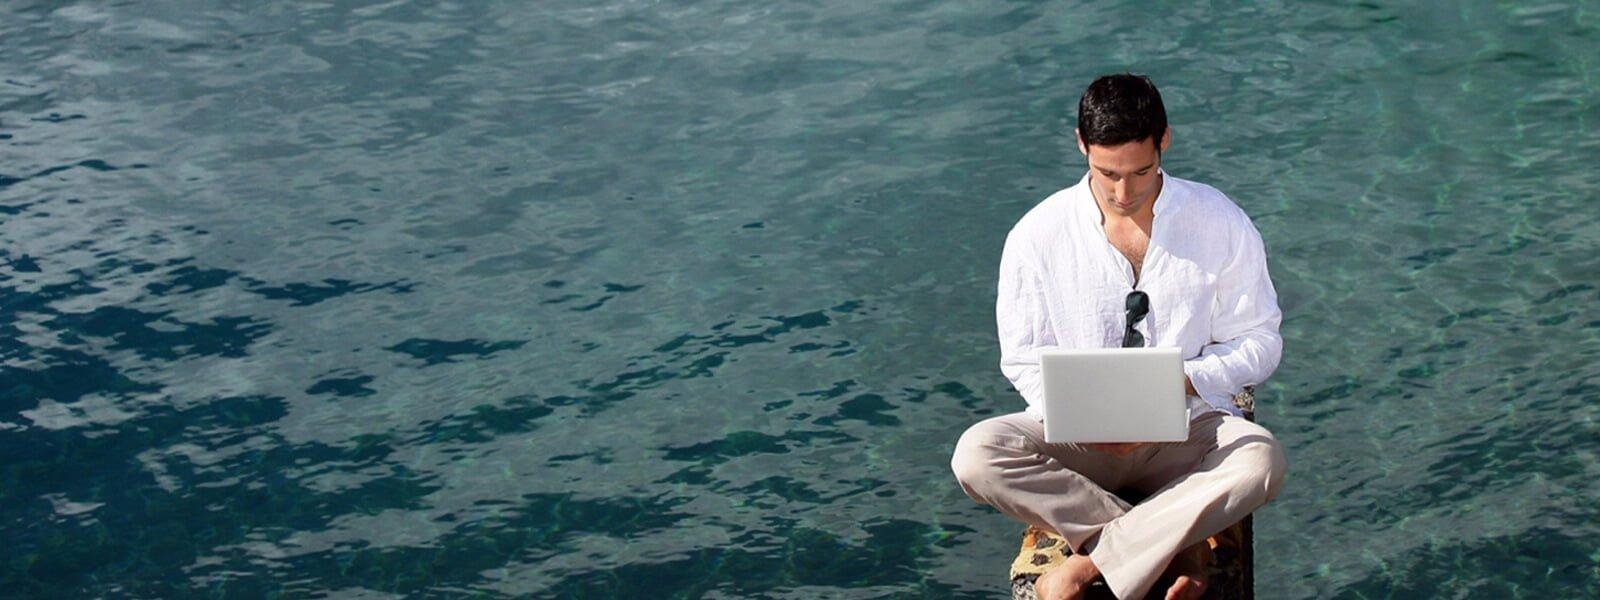 firmamassage mand ved vand